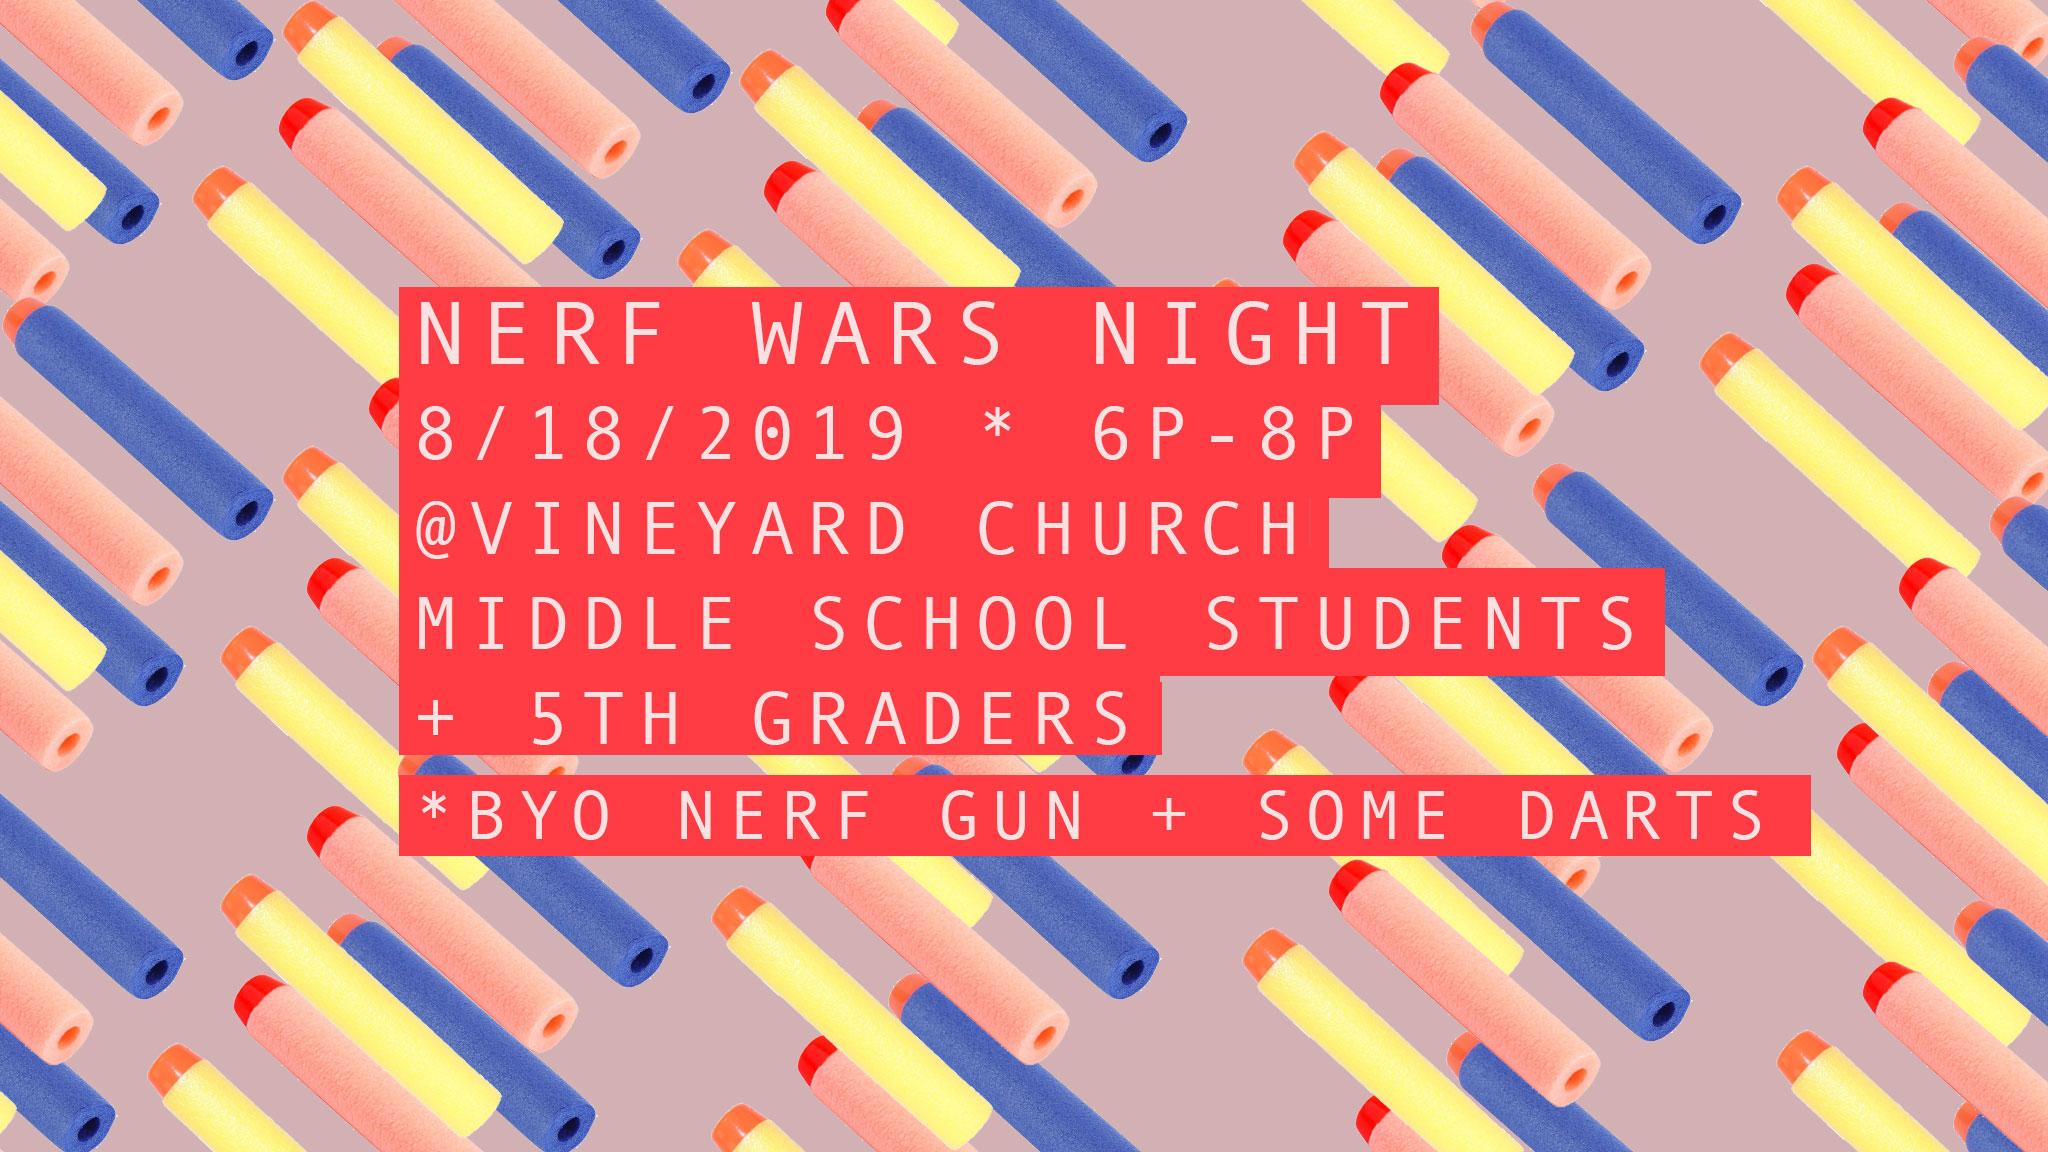 nerf-wars-night.jpg